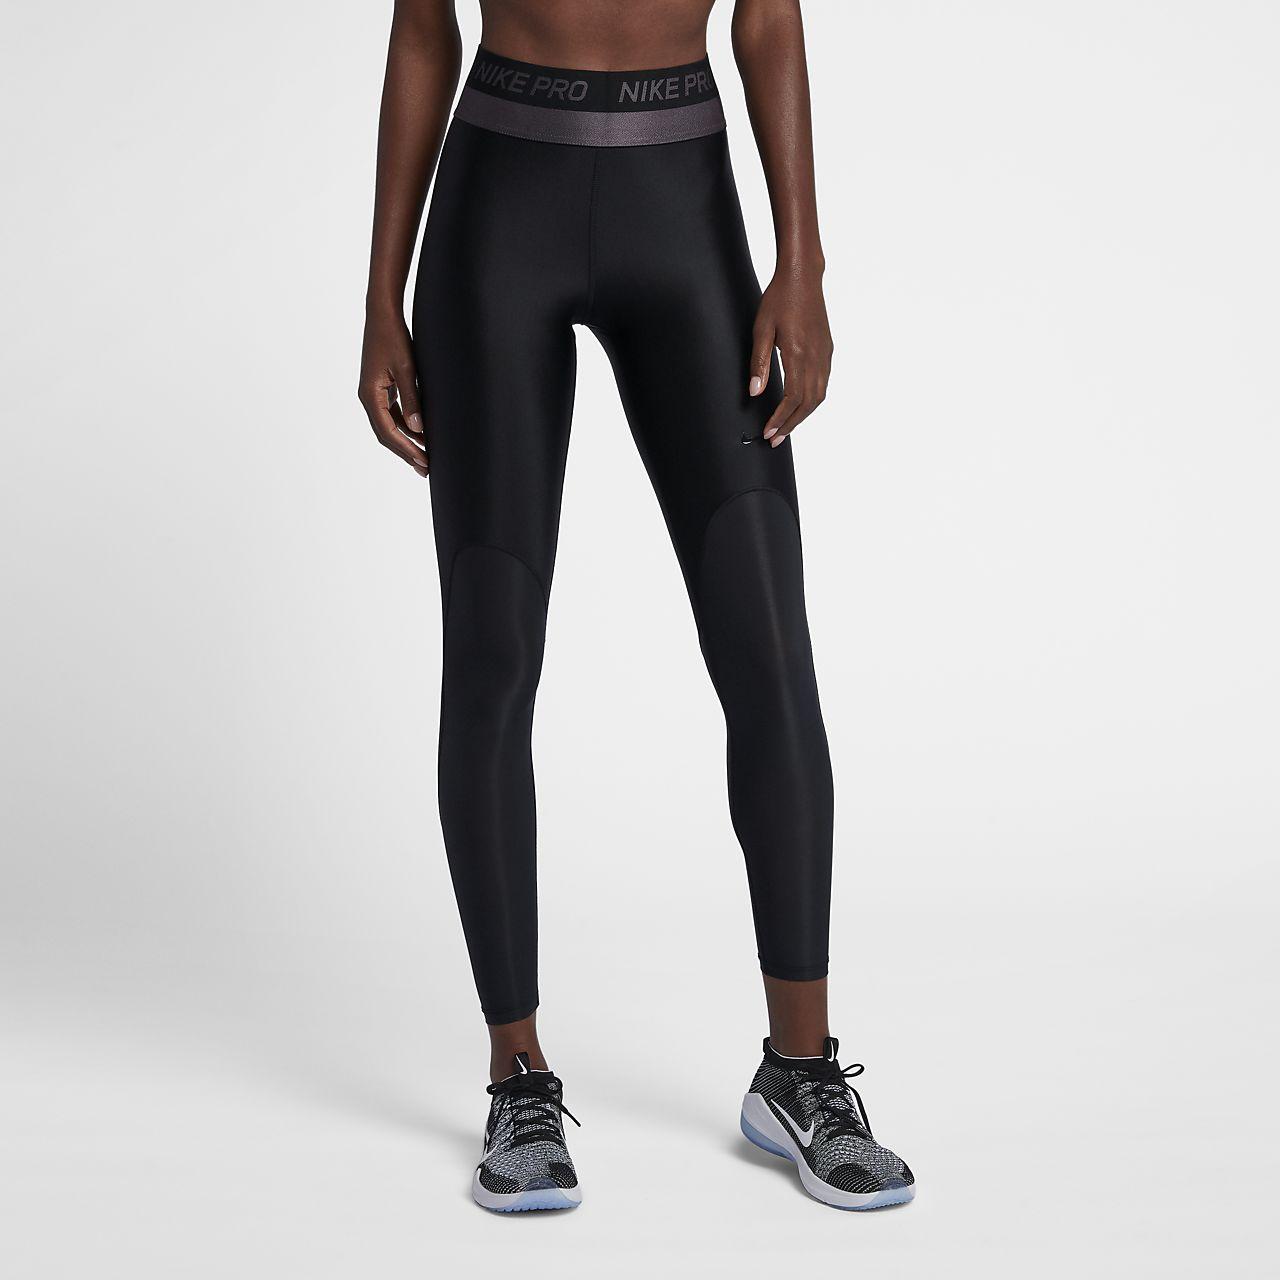 53657bd690 Nike Pro HyperCool Women's Mid-Rise Training Tights. Nike.com GB